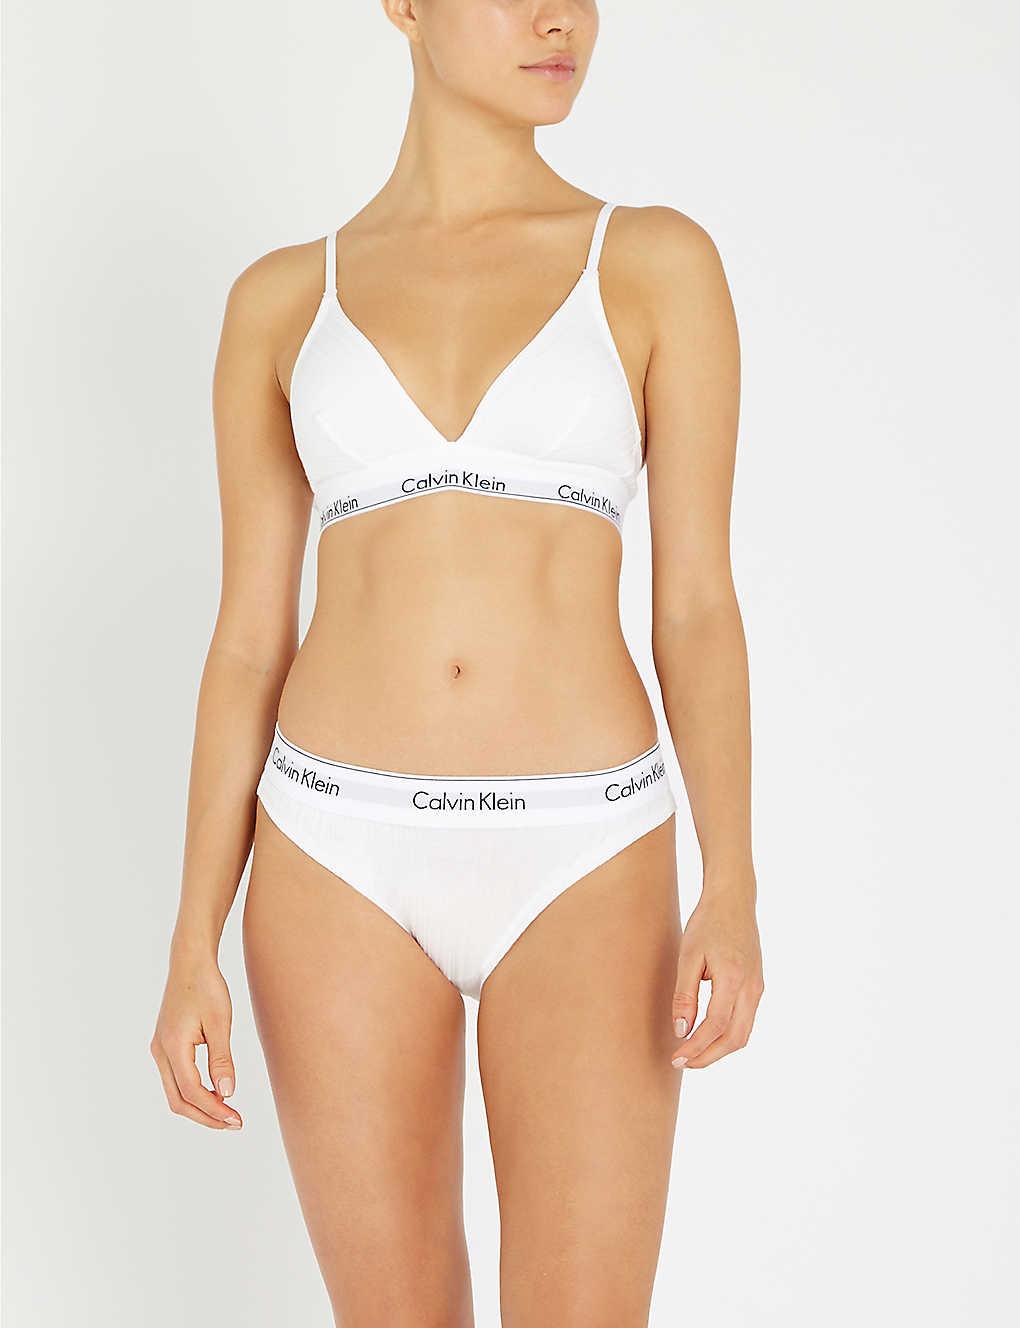 dfafafc0440 CALVIN KLEIN - Modern Cotton ribbed stretch-cotton triangle bra ...